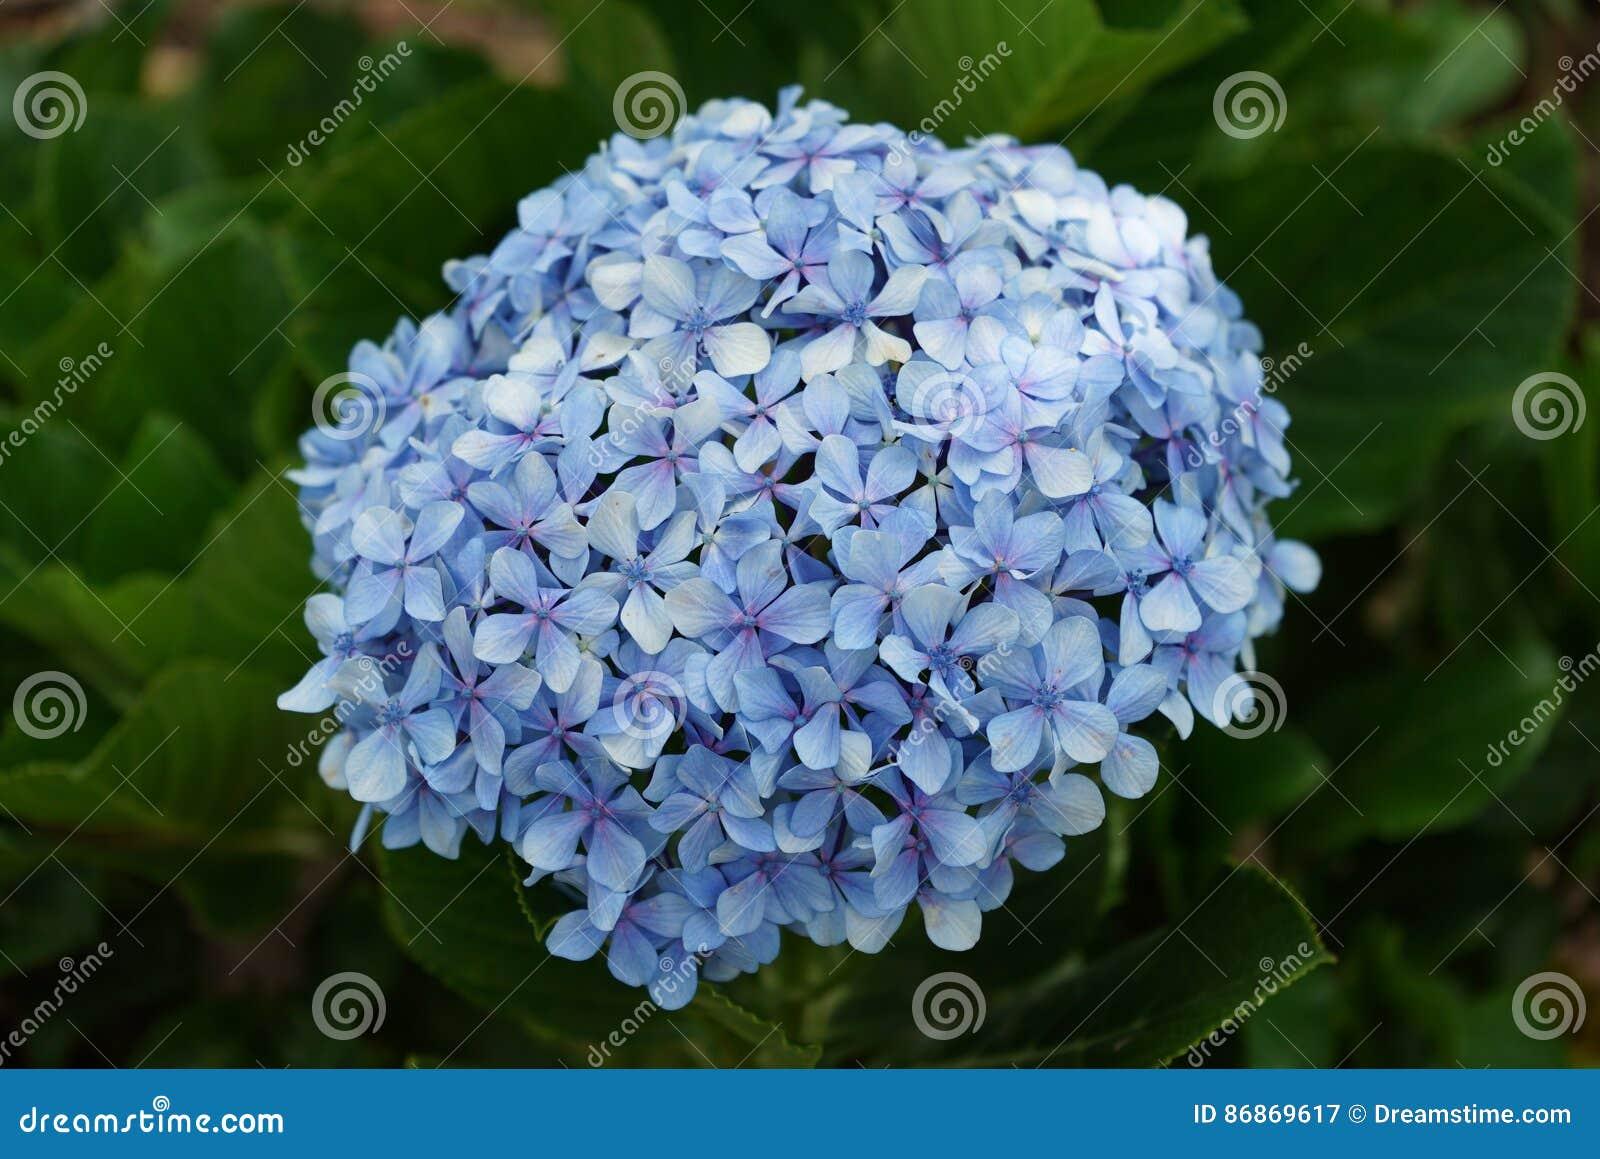 Blue flower hydrangea. Close up.